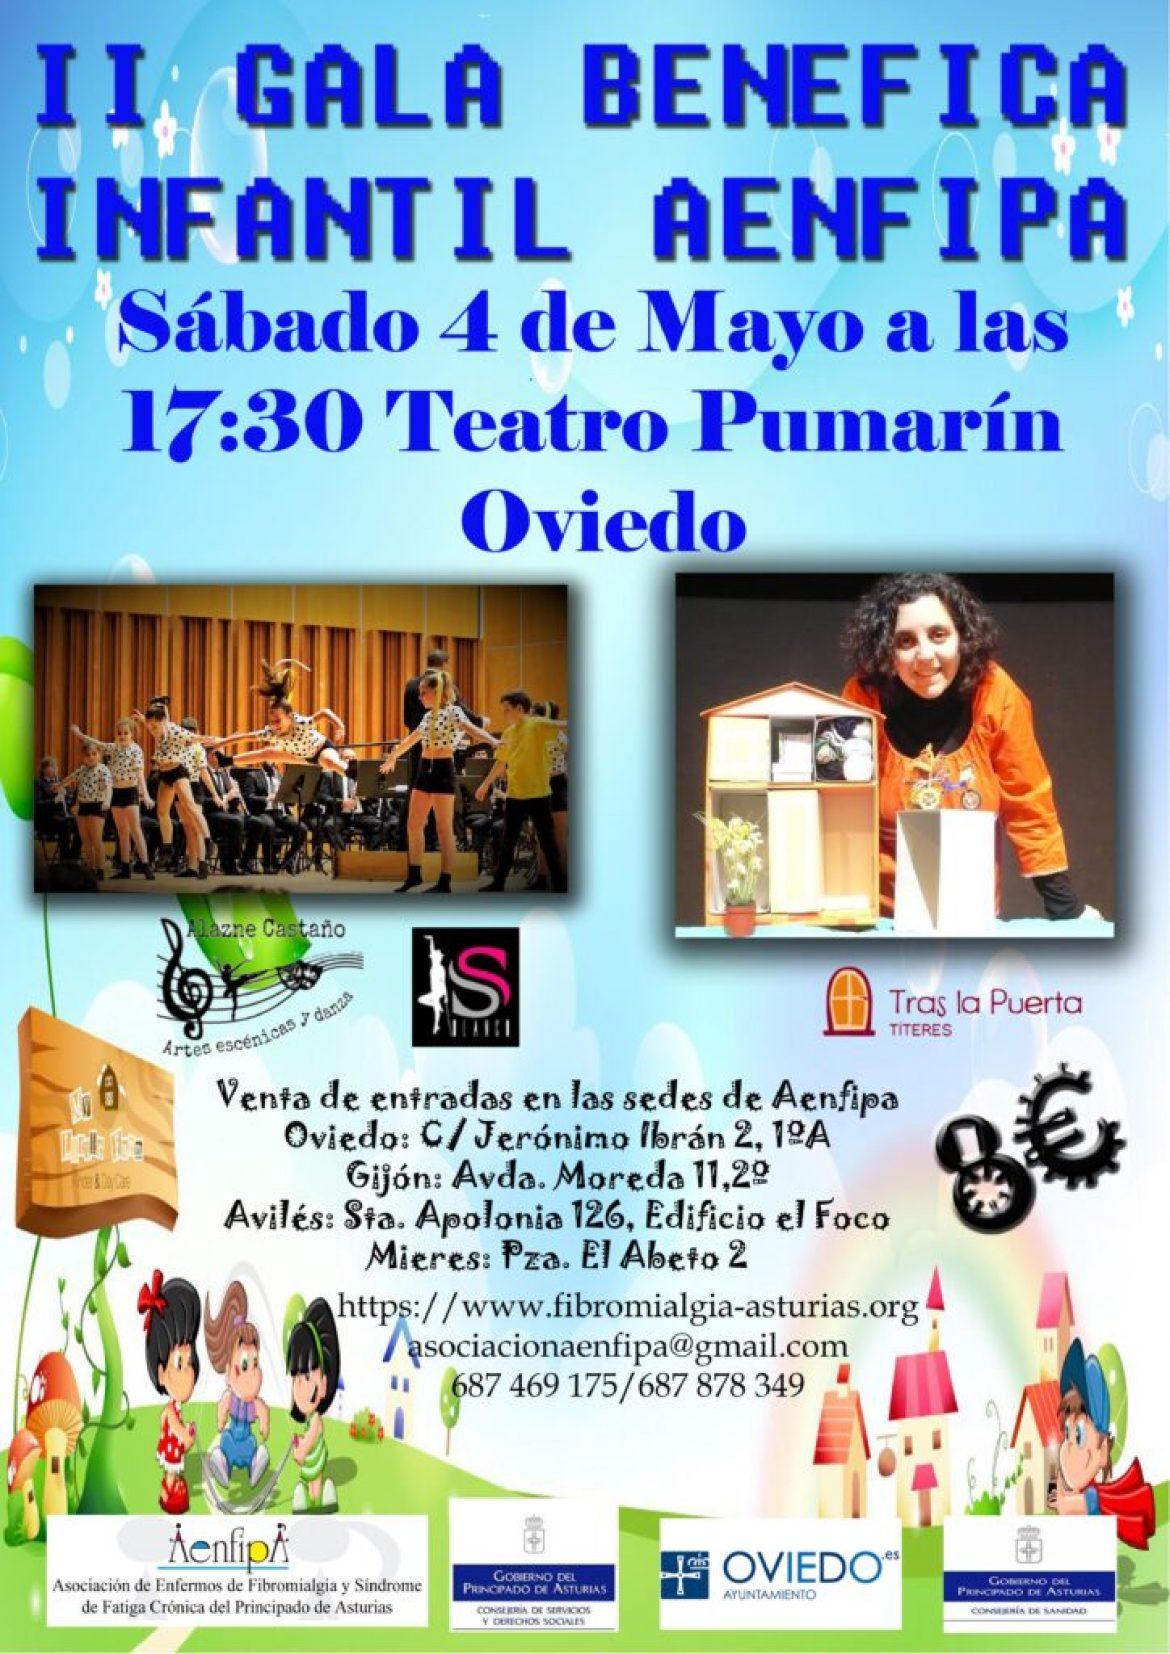 Sábado 4 de Mayo, II Gala Infantil